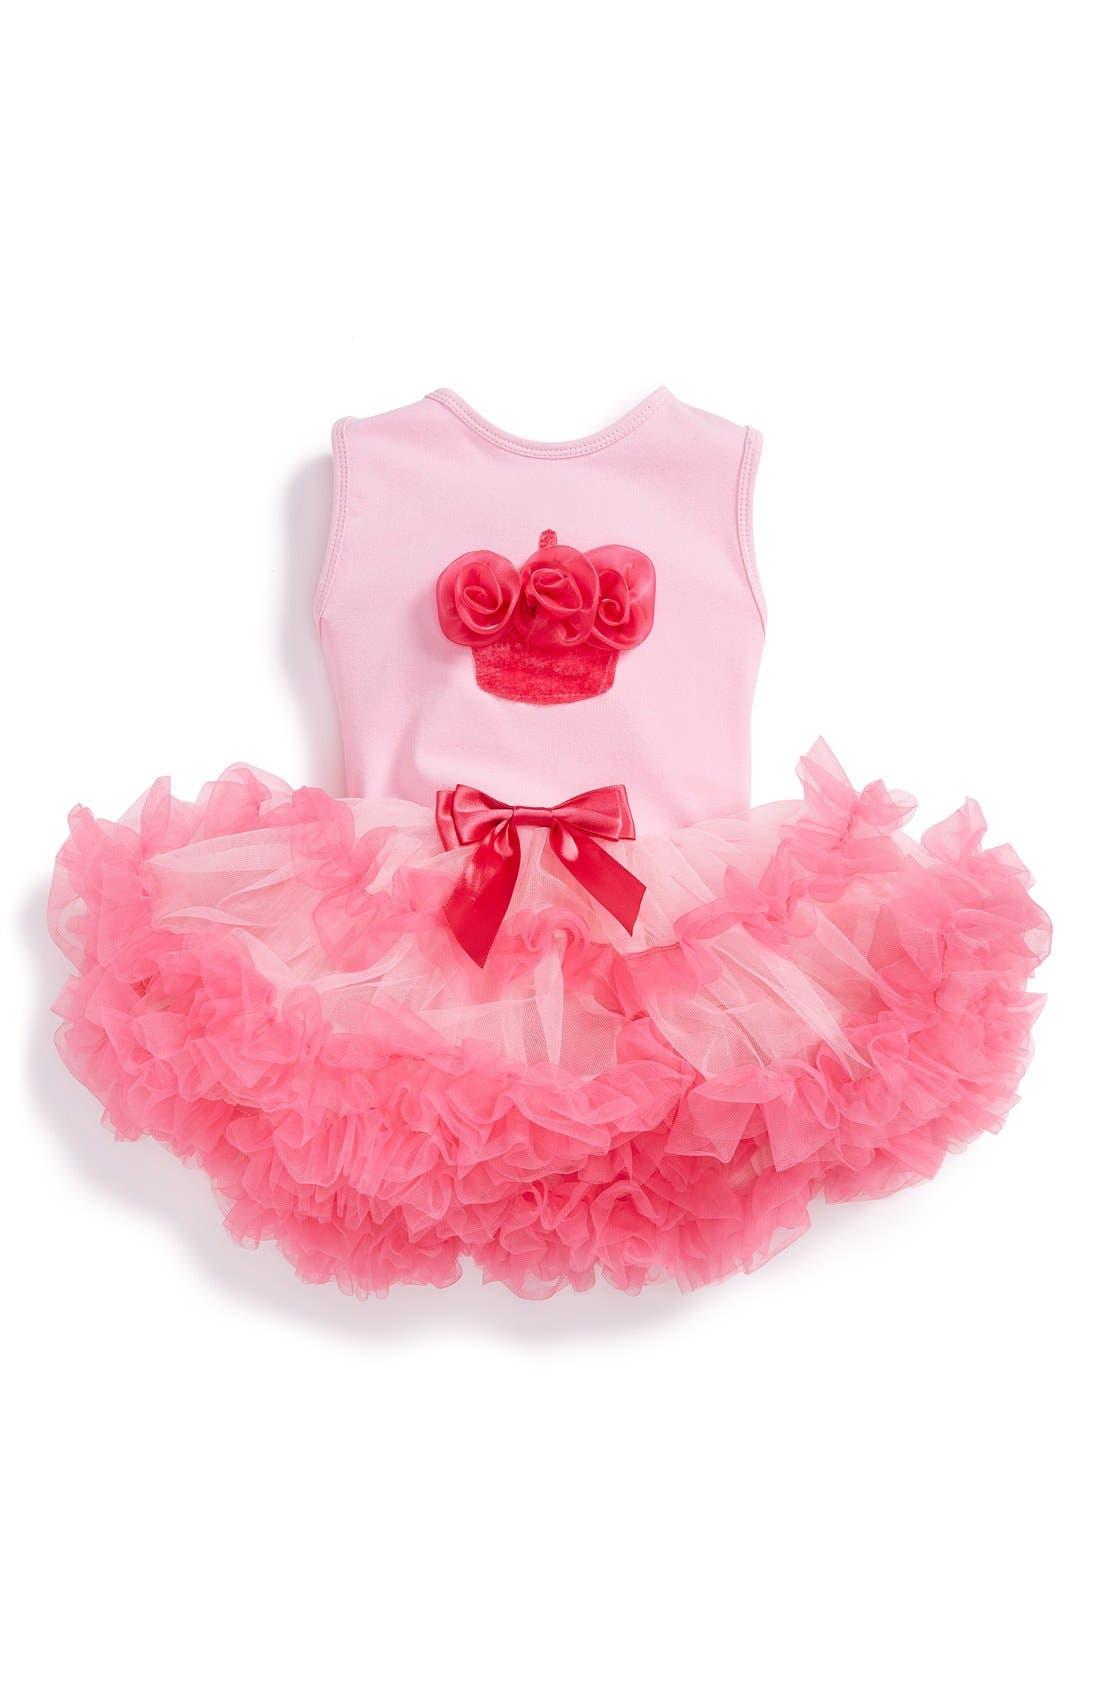 'Birthday' Sleeveless Tutu Dress,                             Main thumbnail 1, color,                             Pink